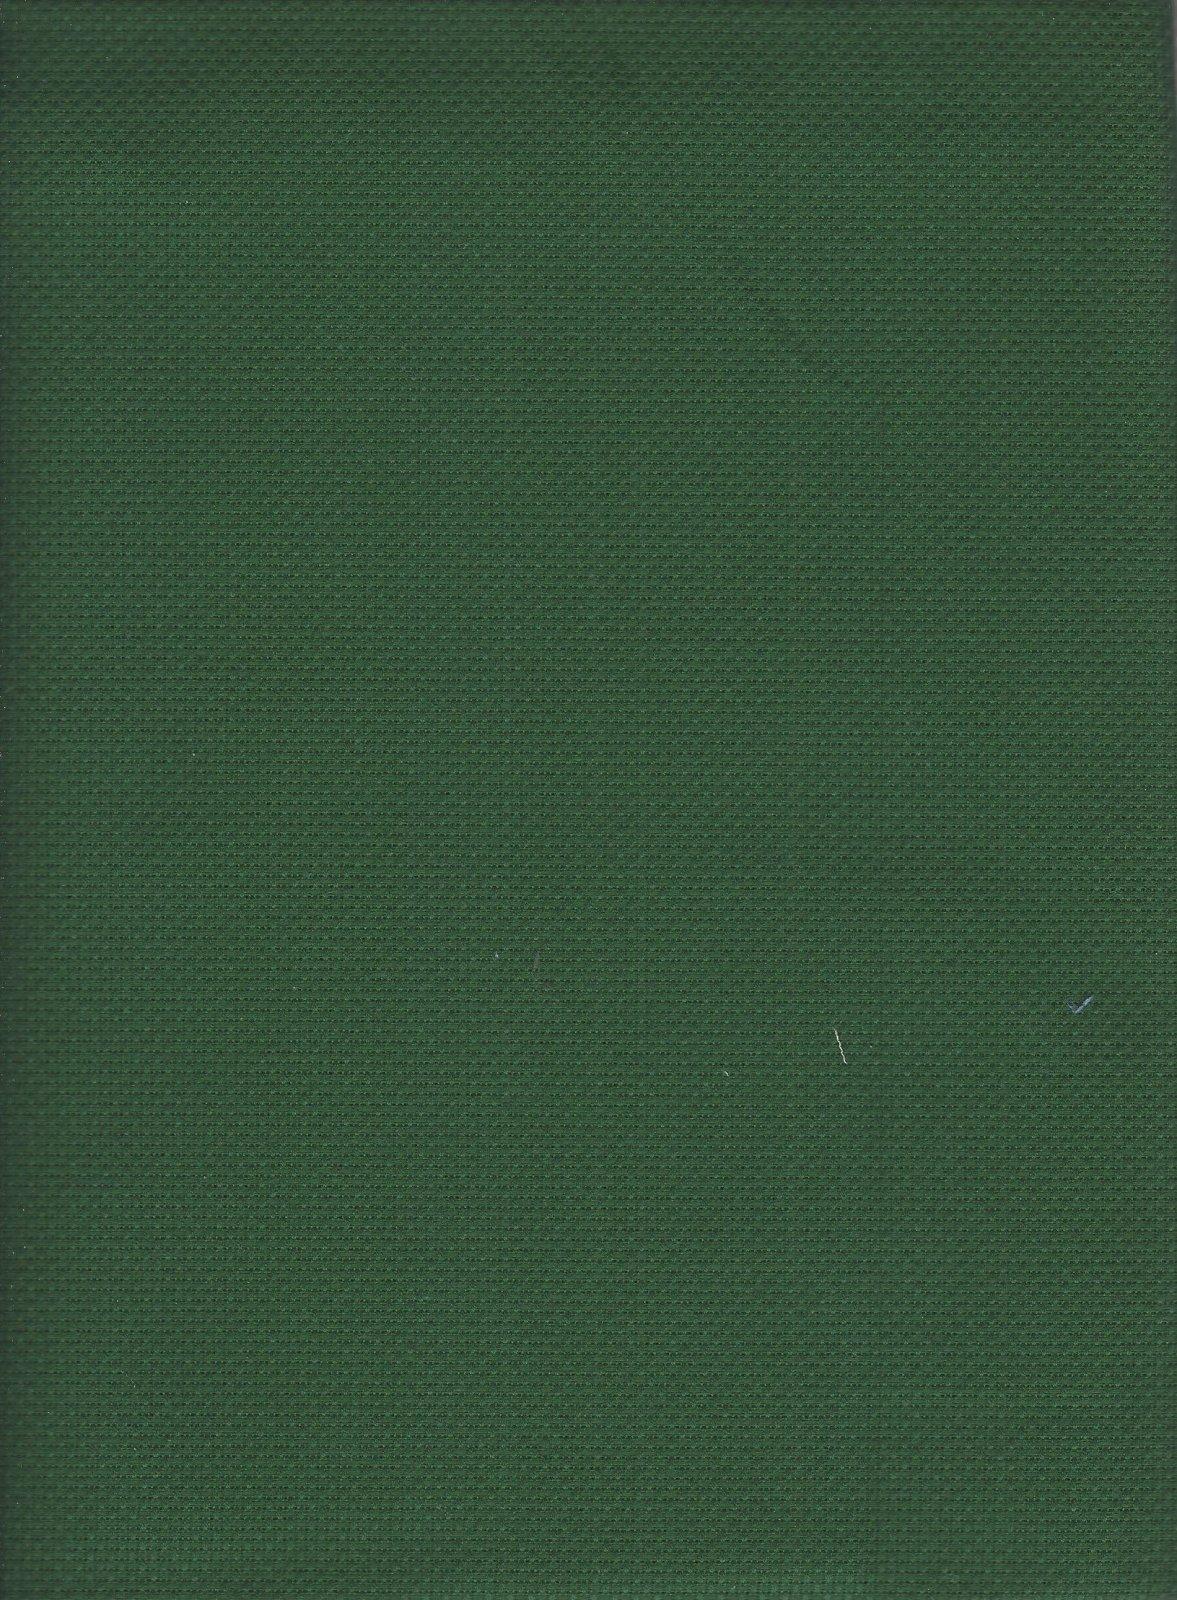 Aida 14ct Victorian Green (discontinued color)